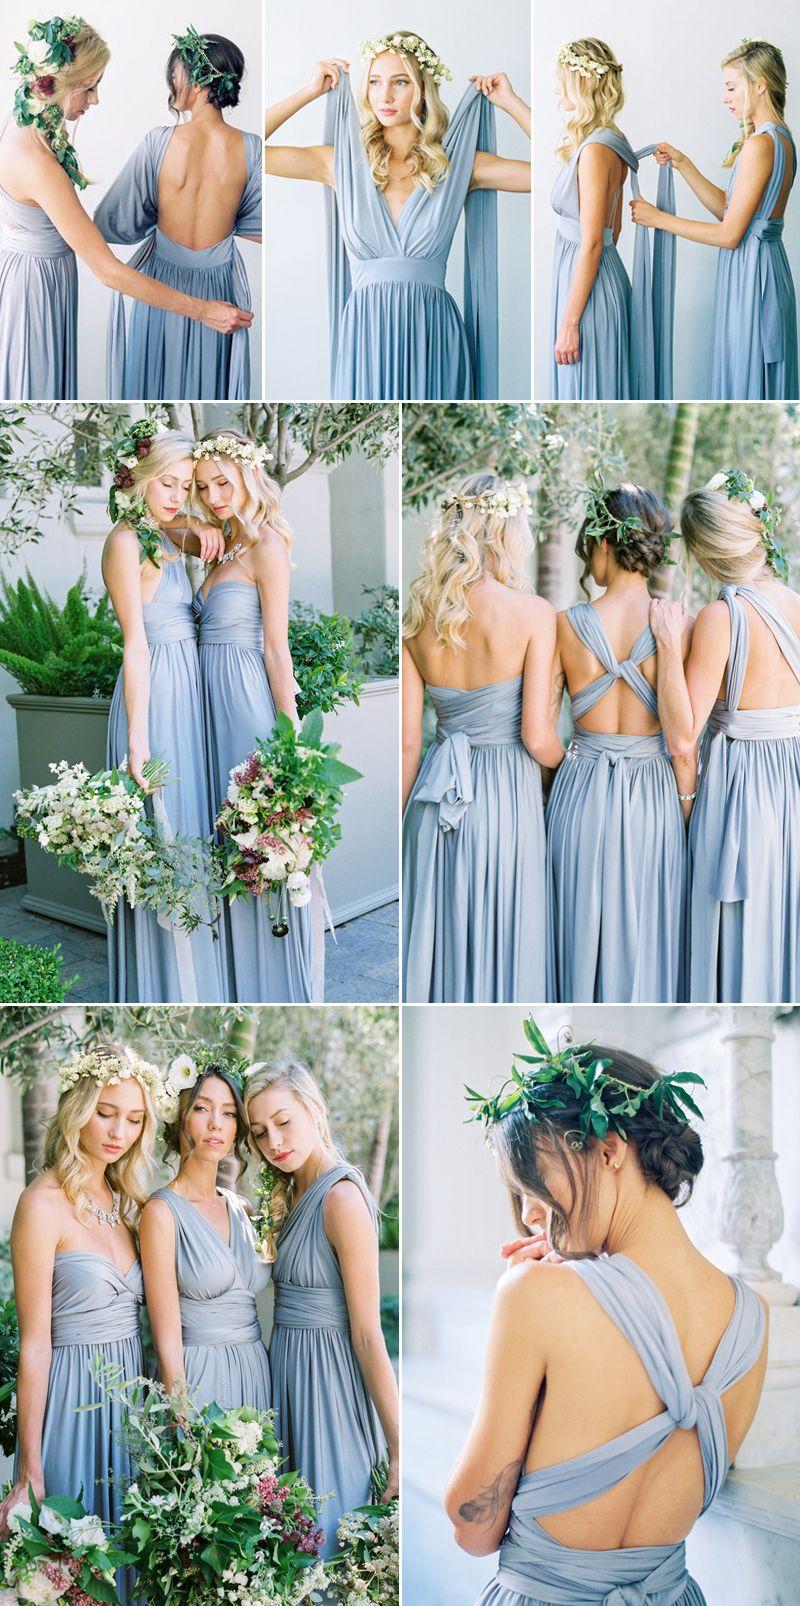 28 super stylish convertible twist wrap bridesmaid dresses your 28 super stylish convertible twist wrap bridesmaid dresses your girls will love ombrellifo Gallery